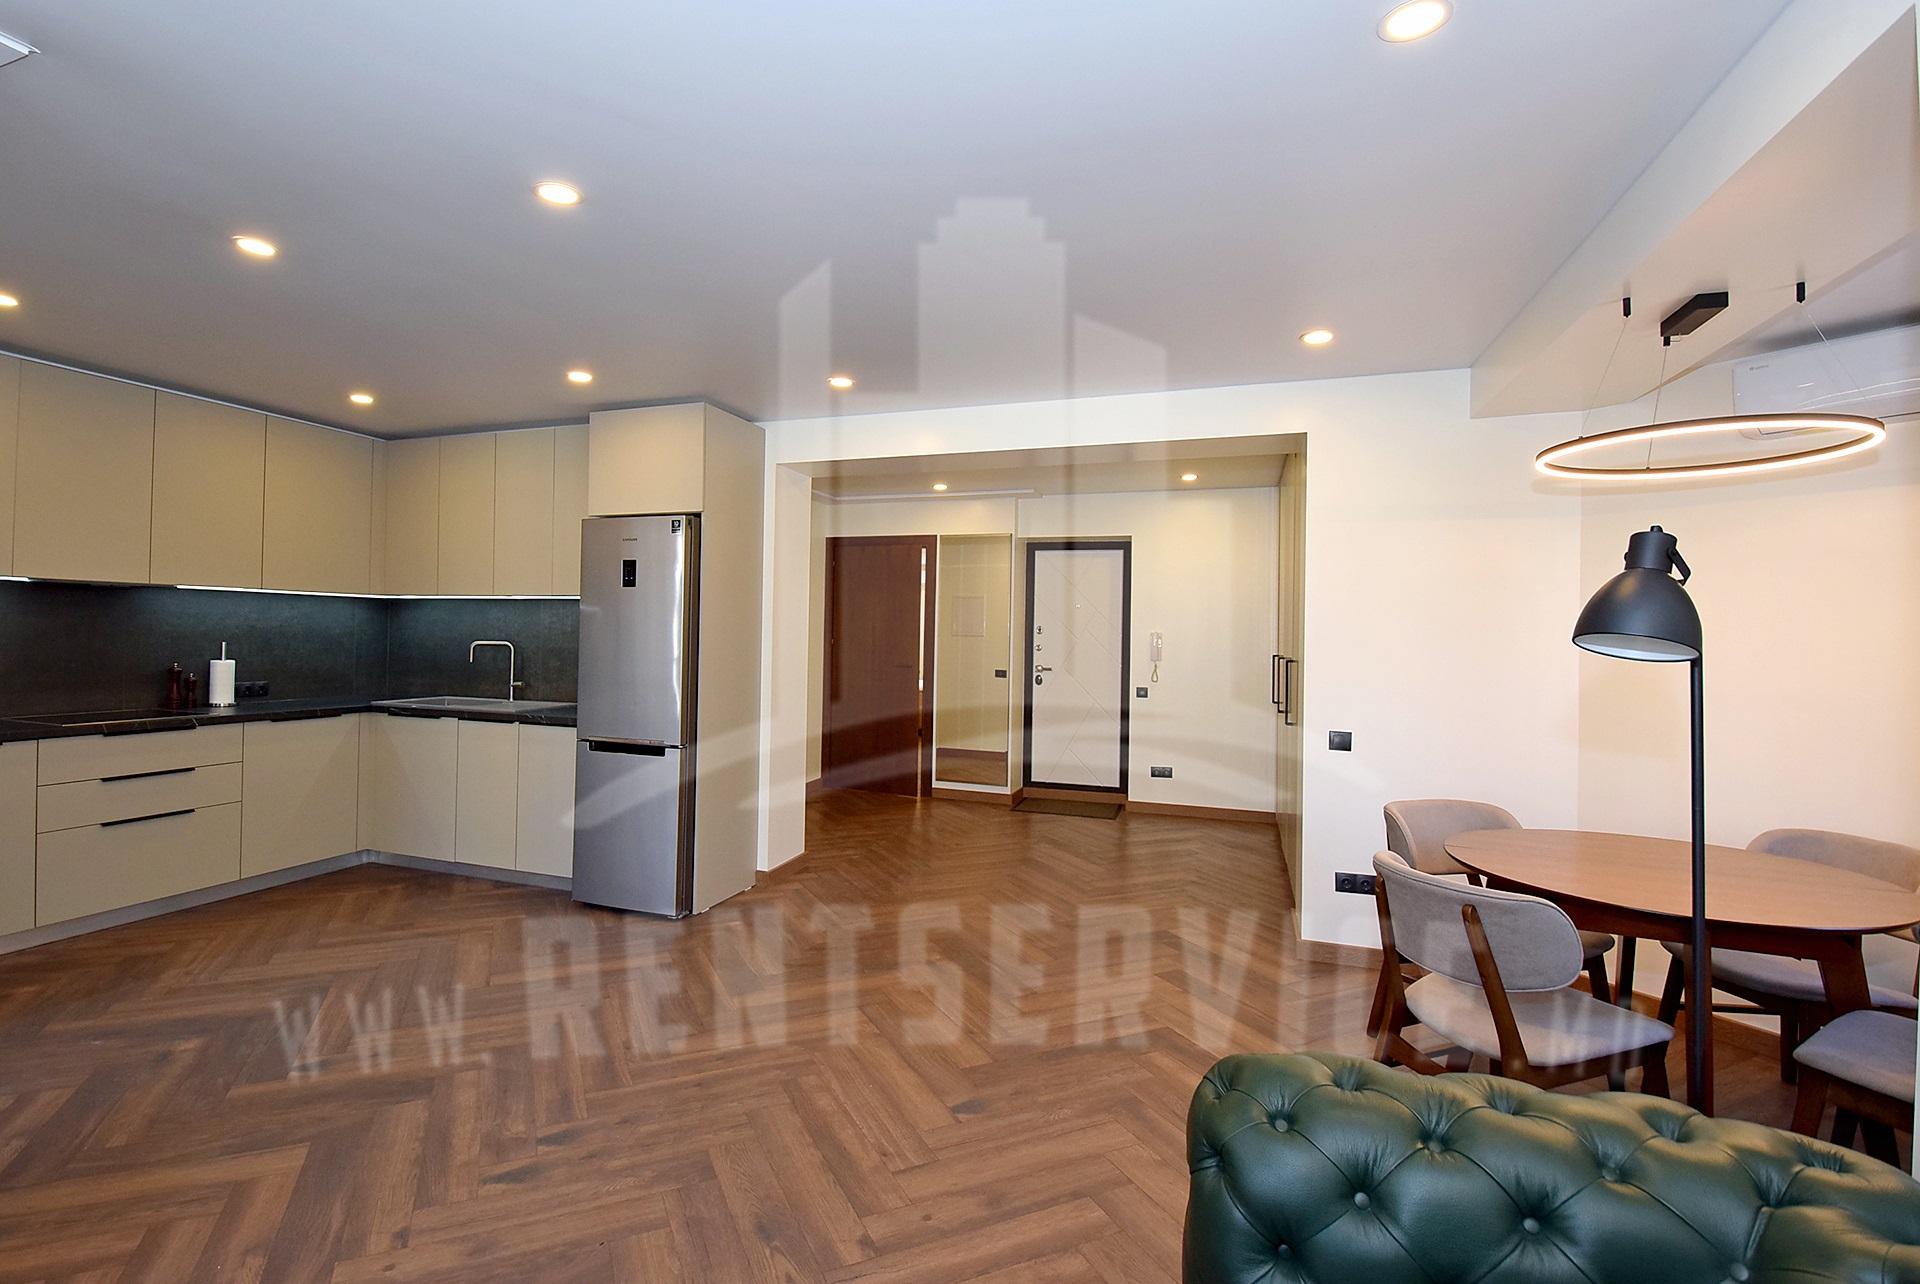 289_apartment_3.JPG